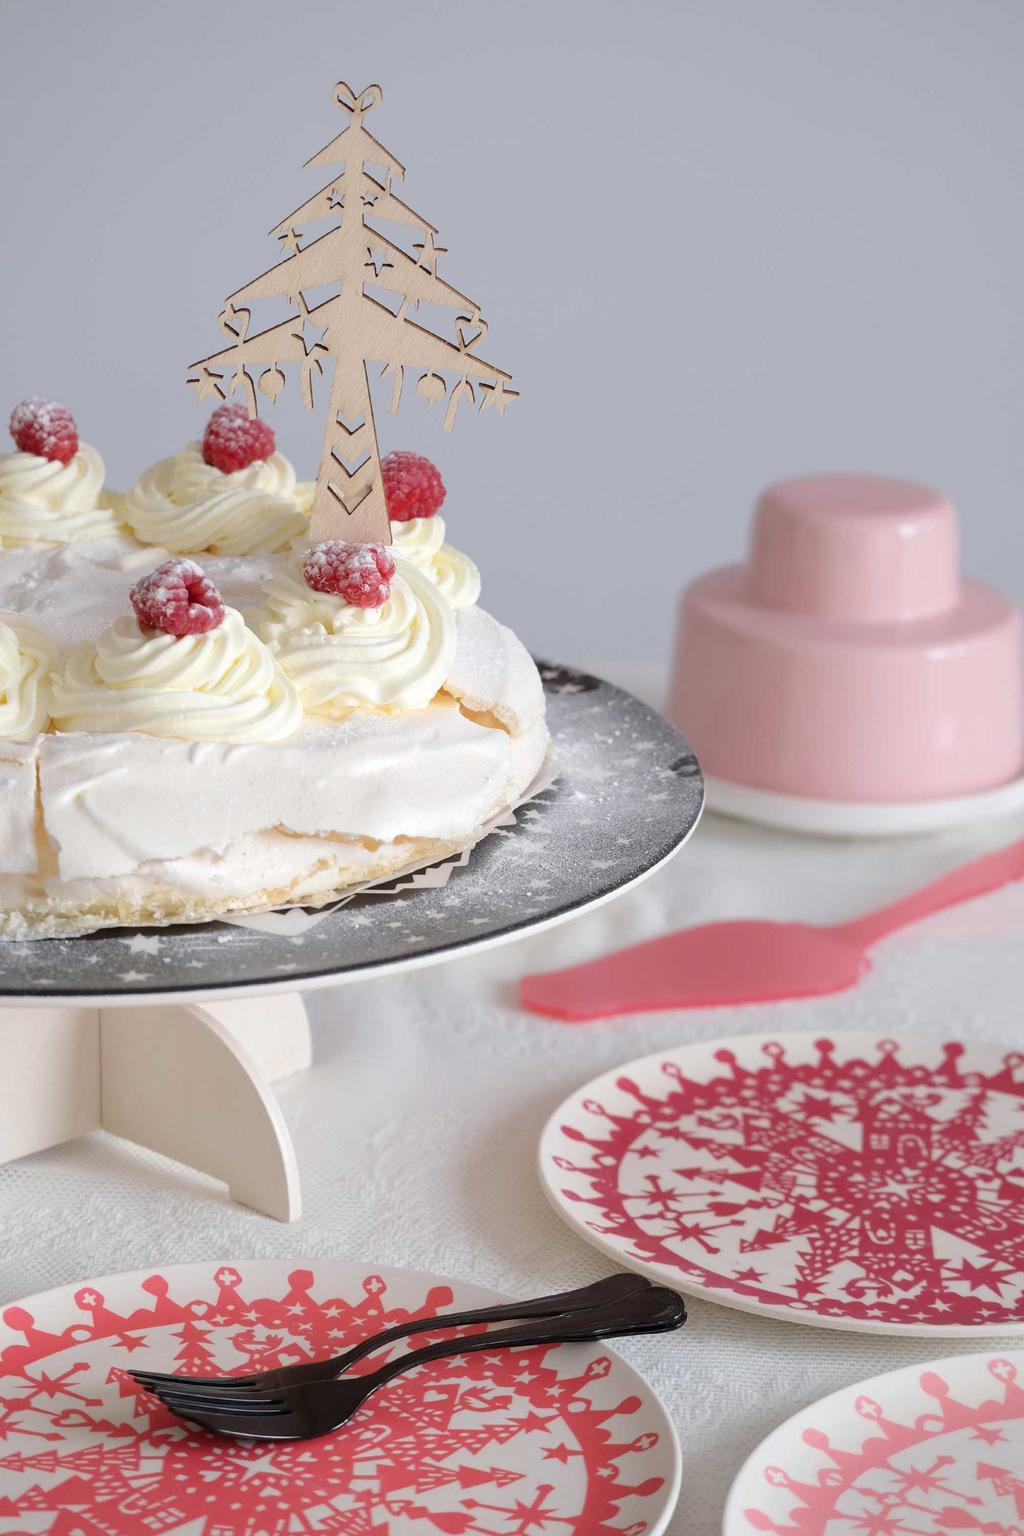 Kerstservies PRCHTG taart